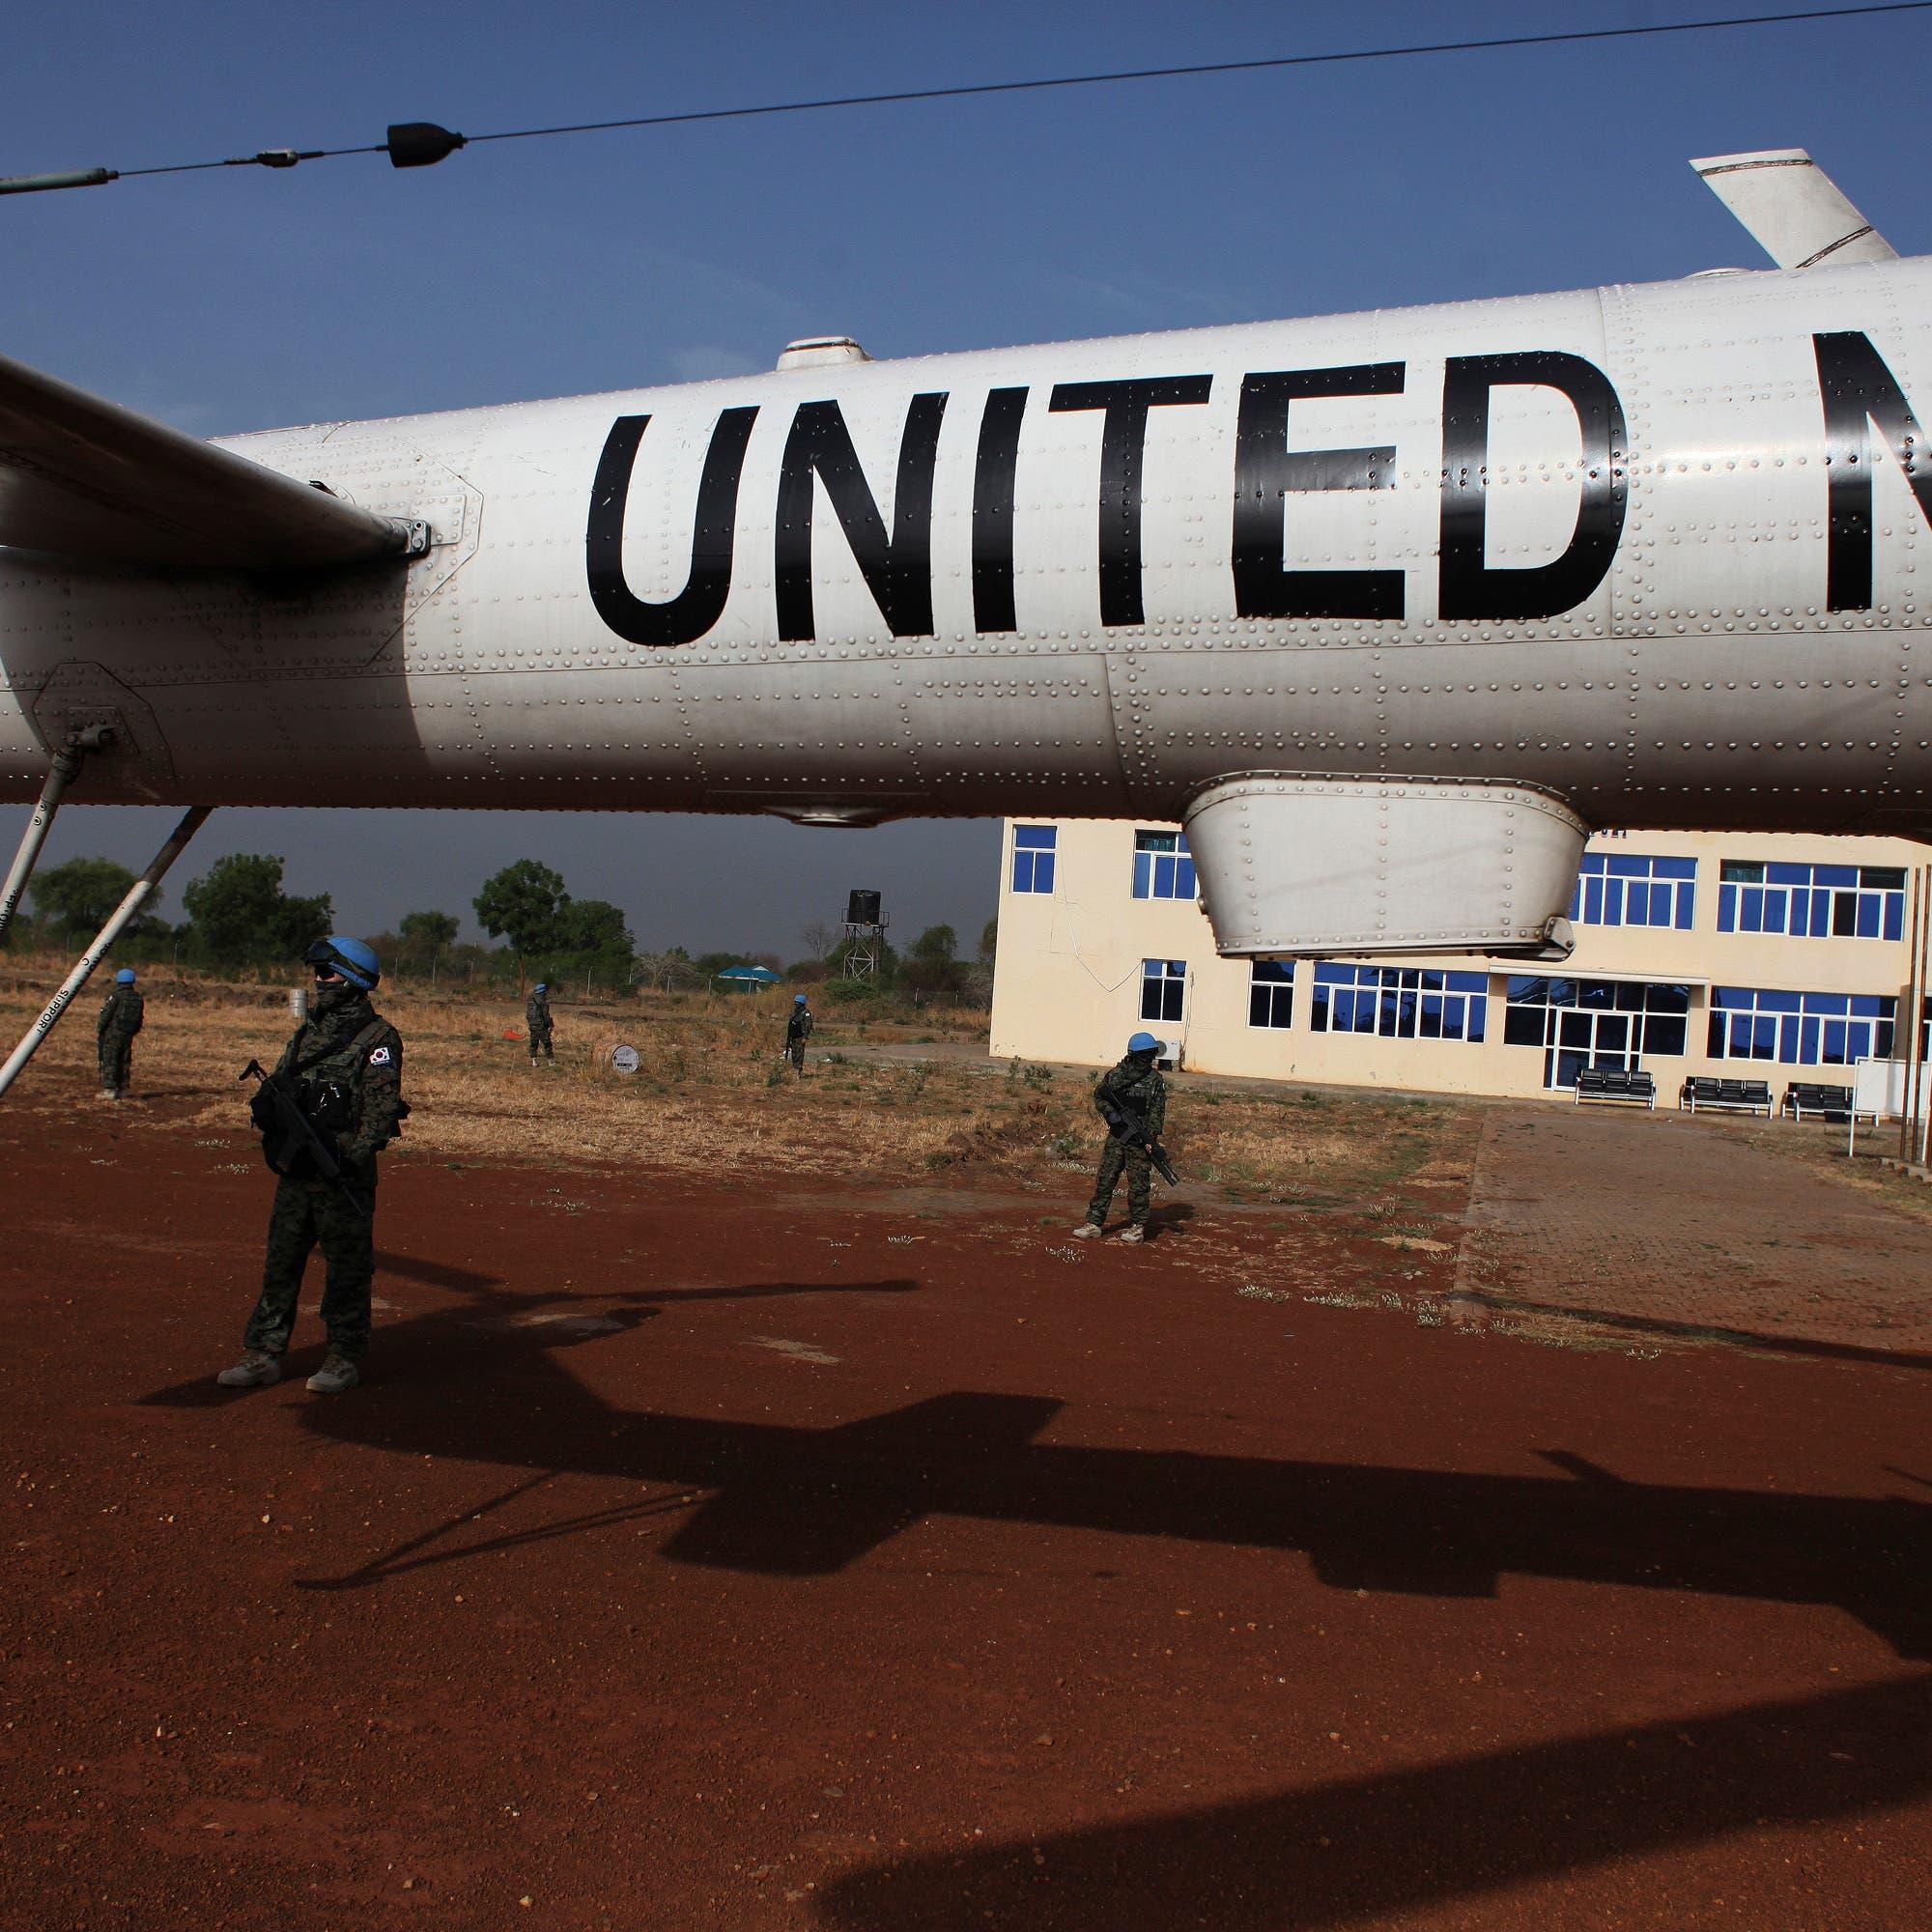 خلاف بين واشنطن وموسكو حول اتفاق السلام بجنوب السودان